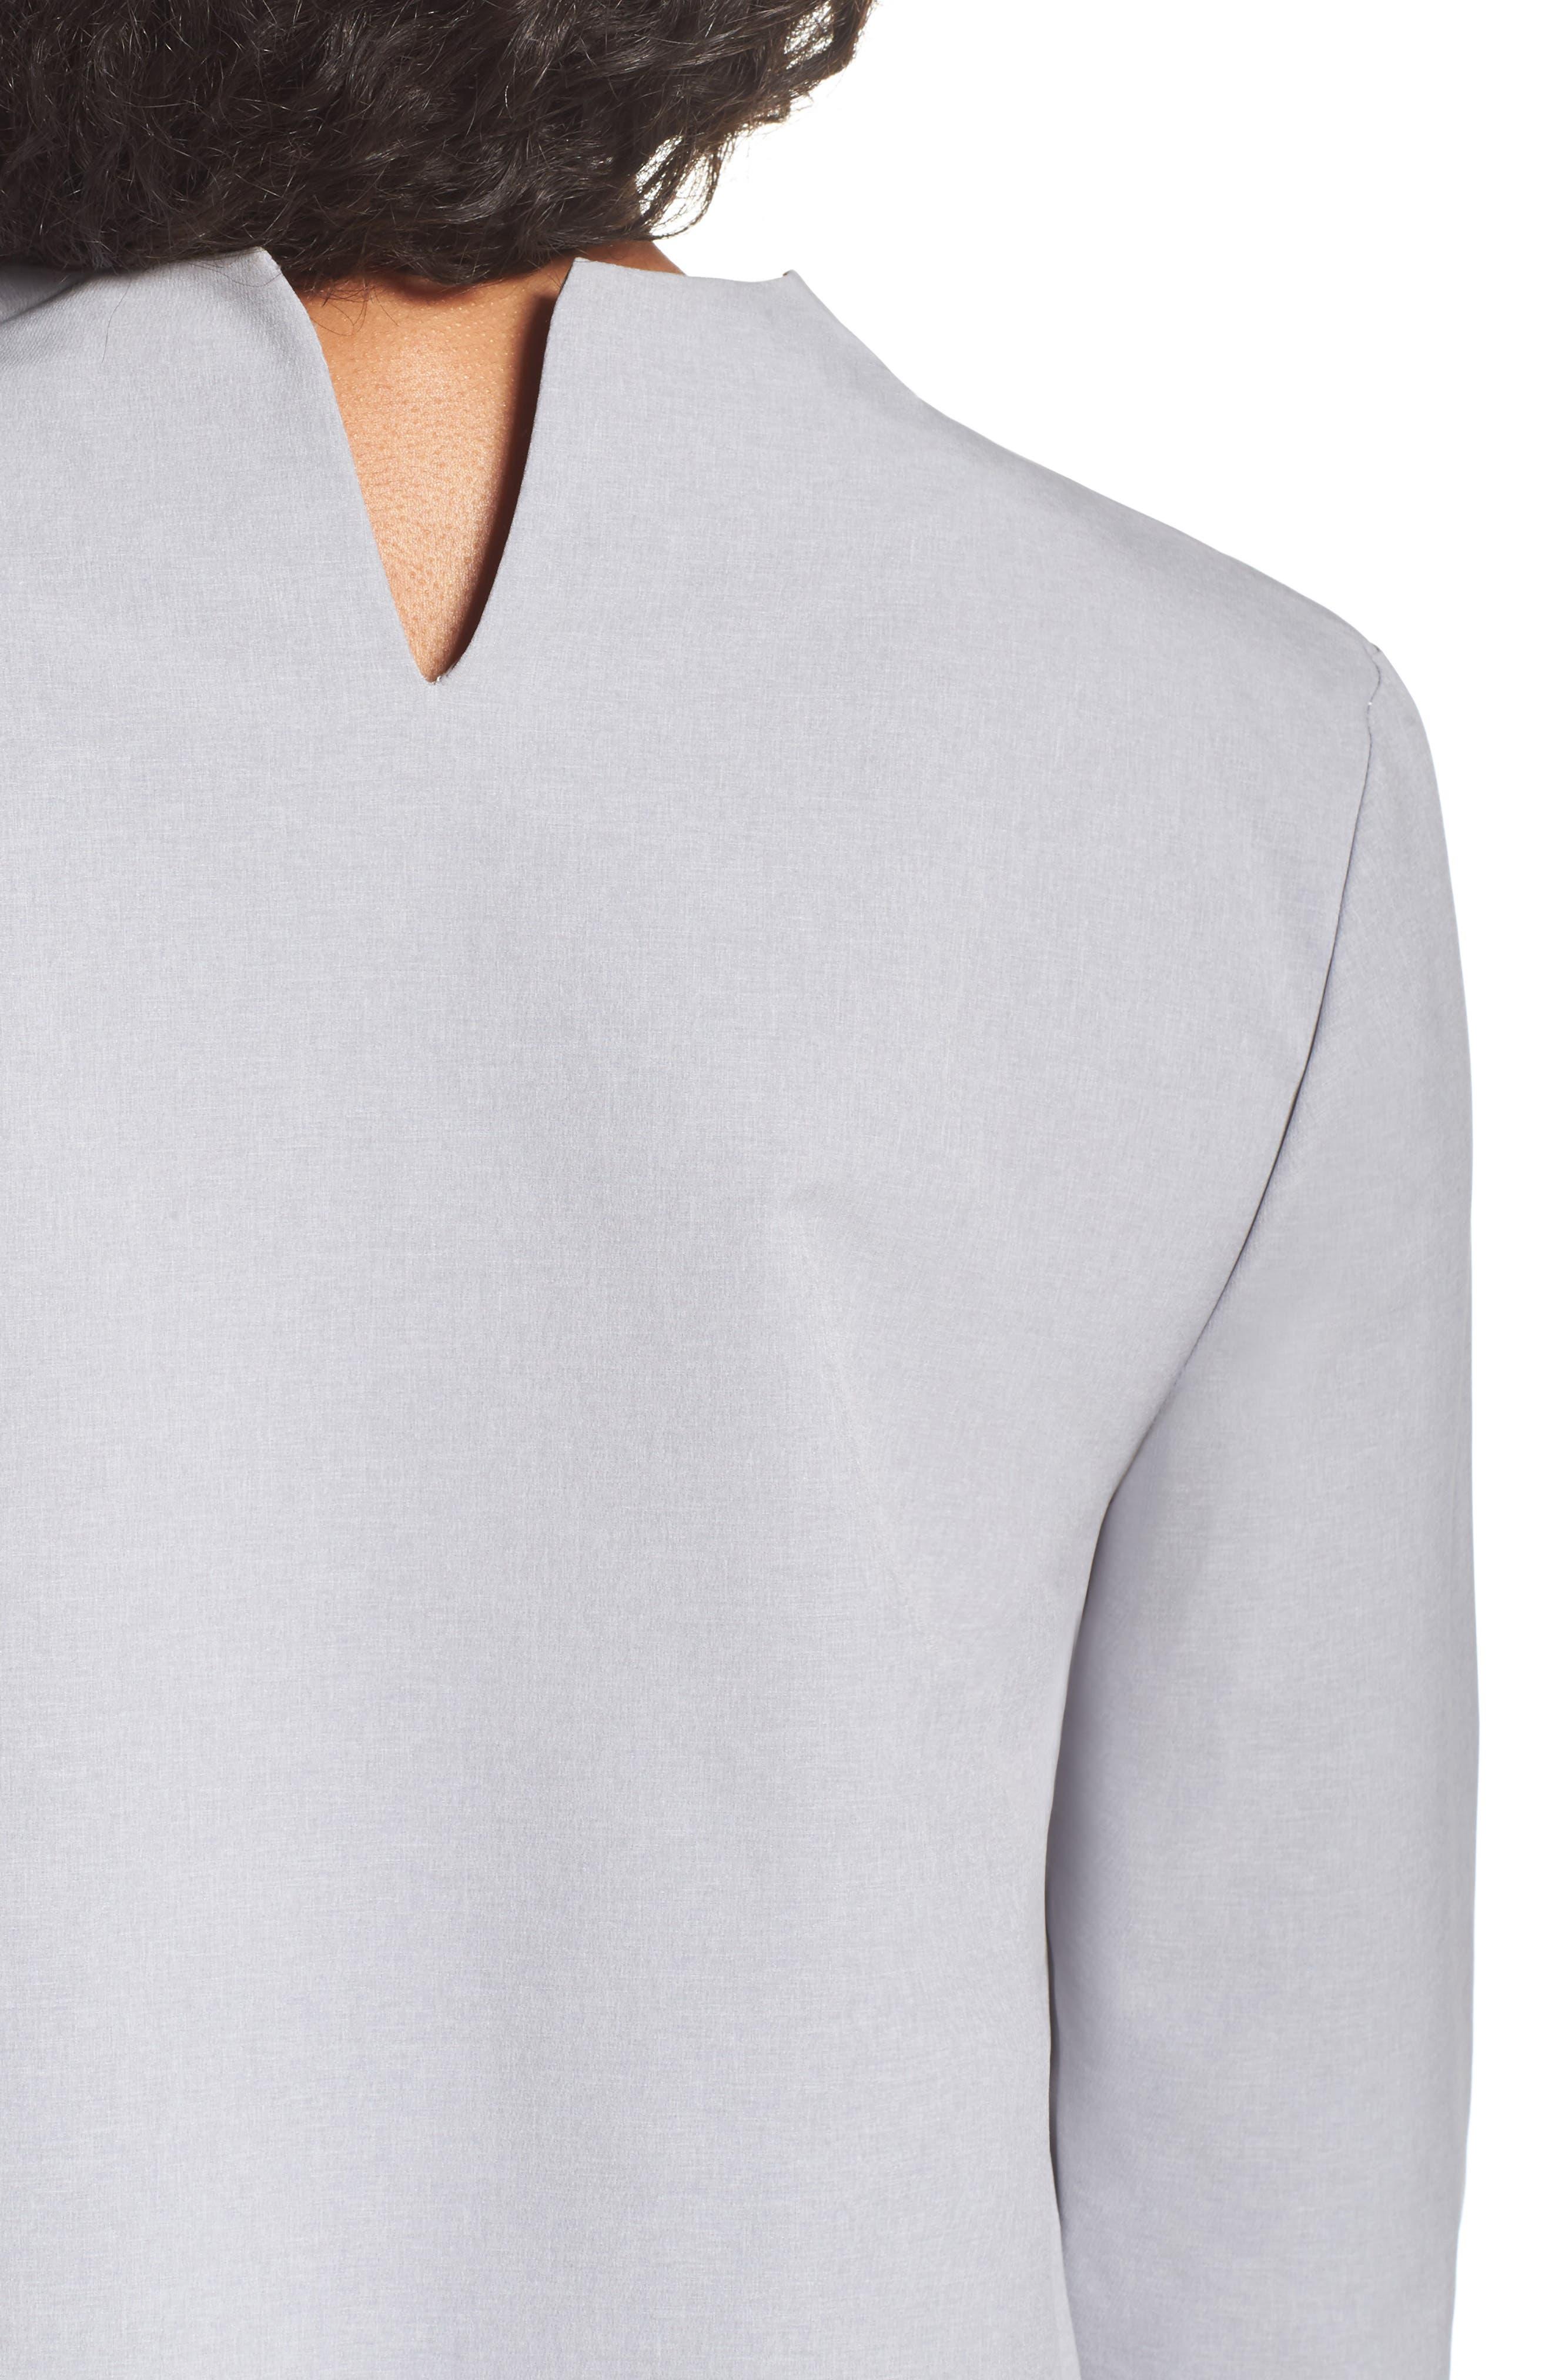 EQT Pullover,                             Alternate thumbnail 4, color,                             Medium Grey Heather